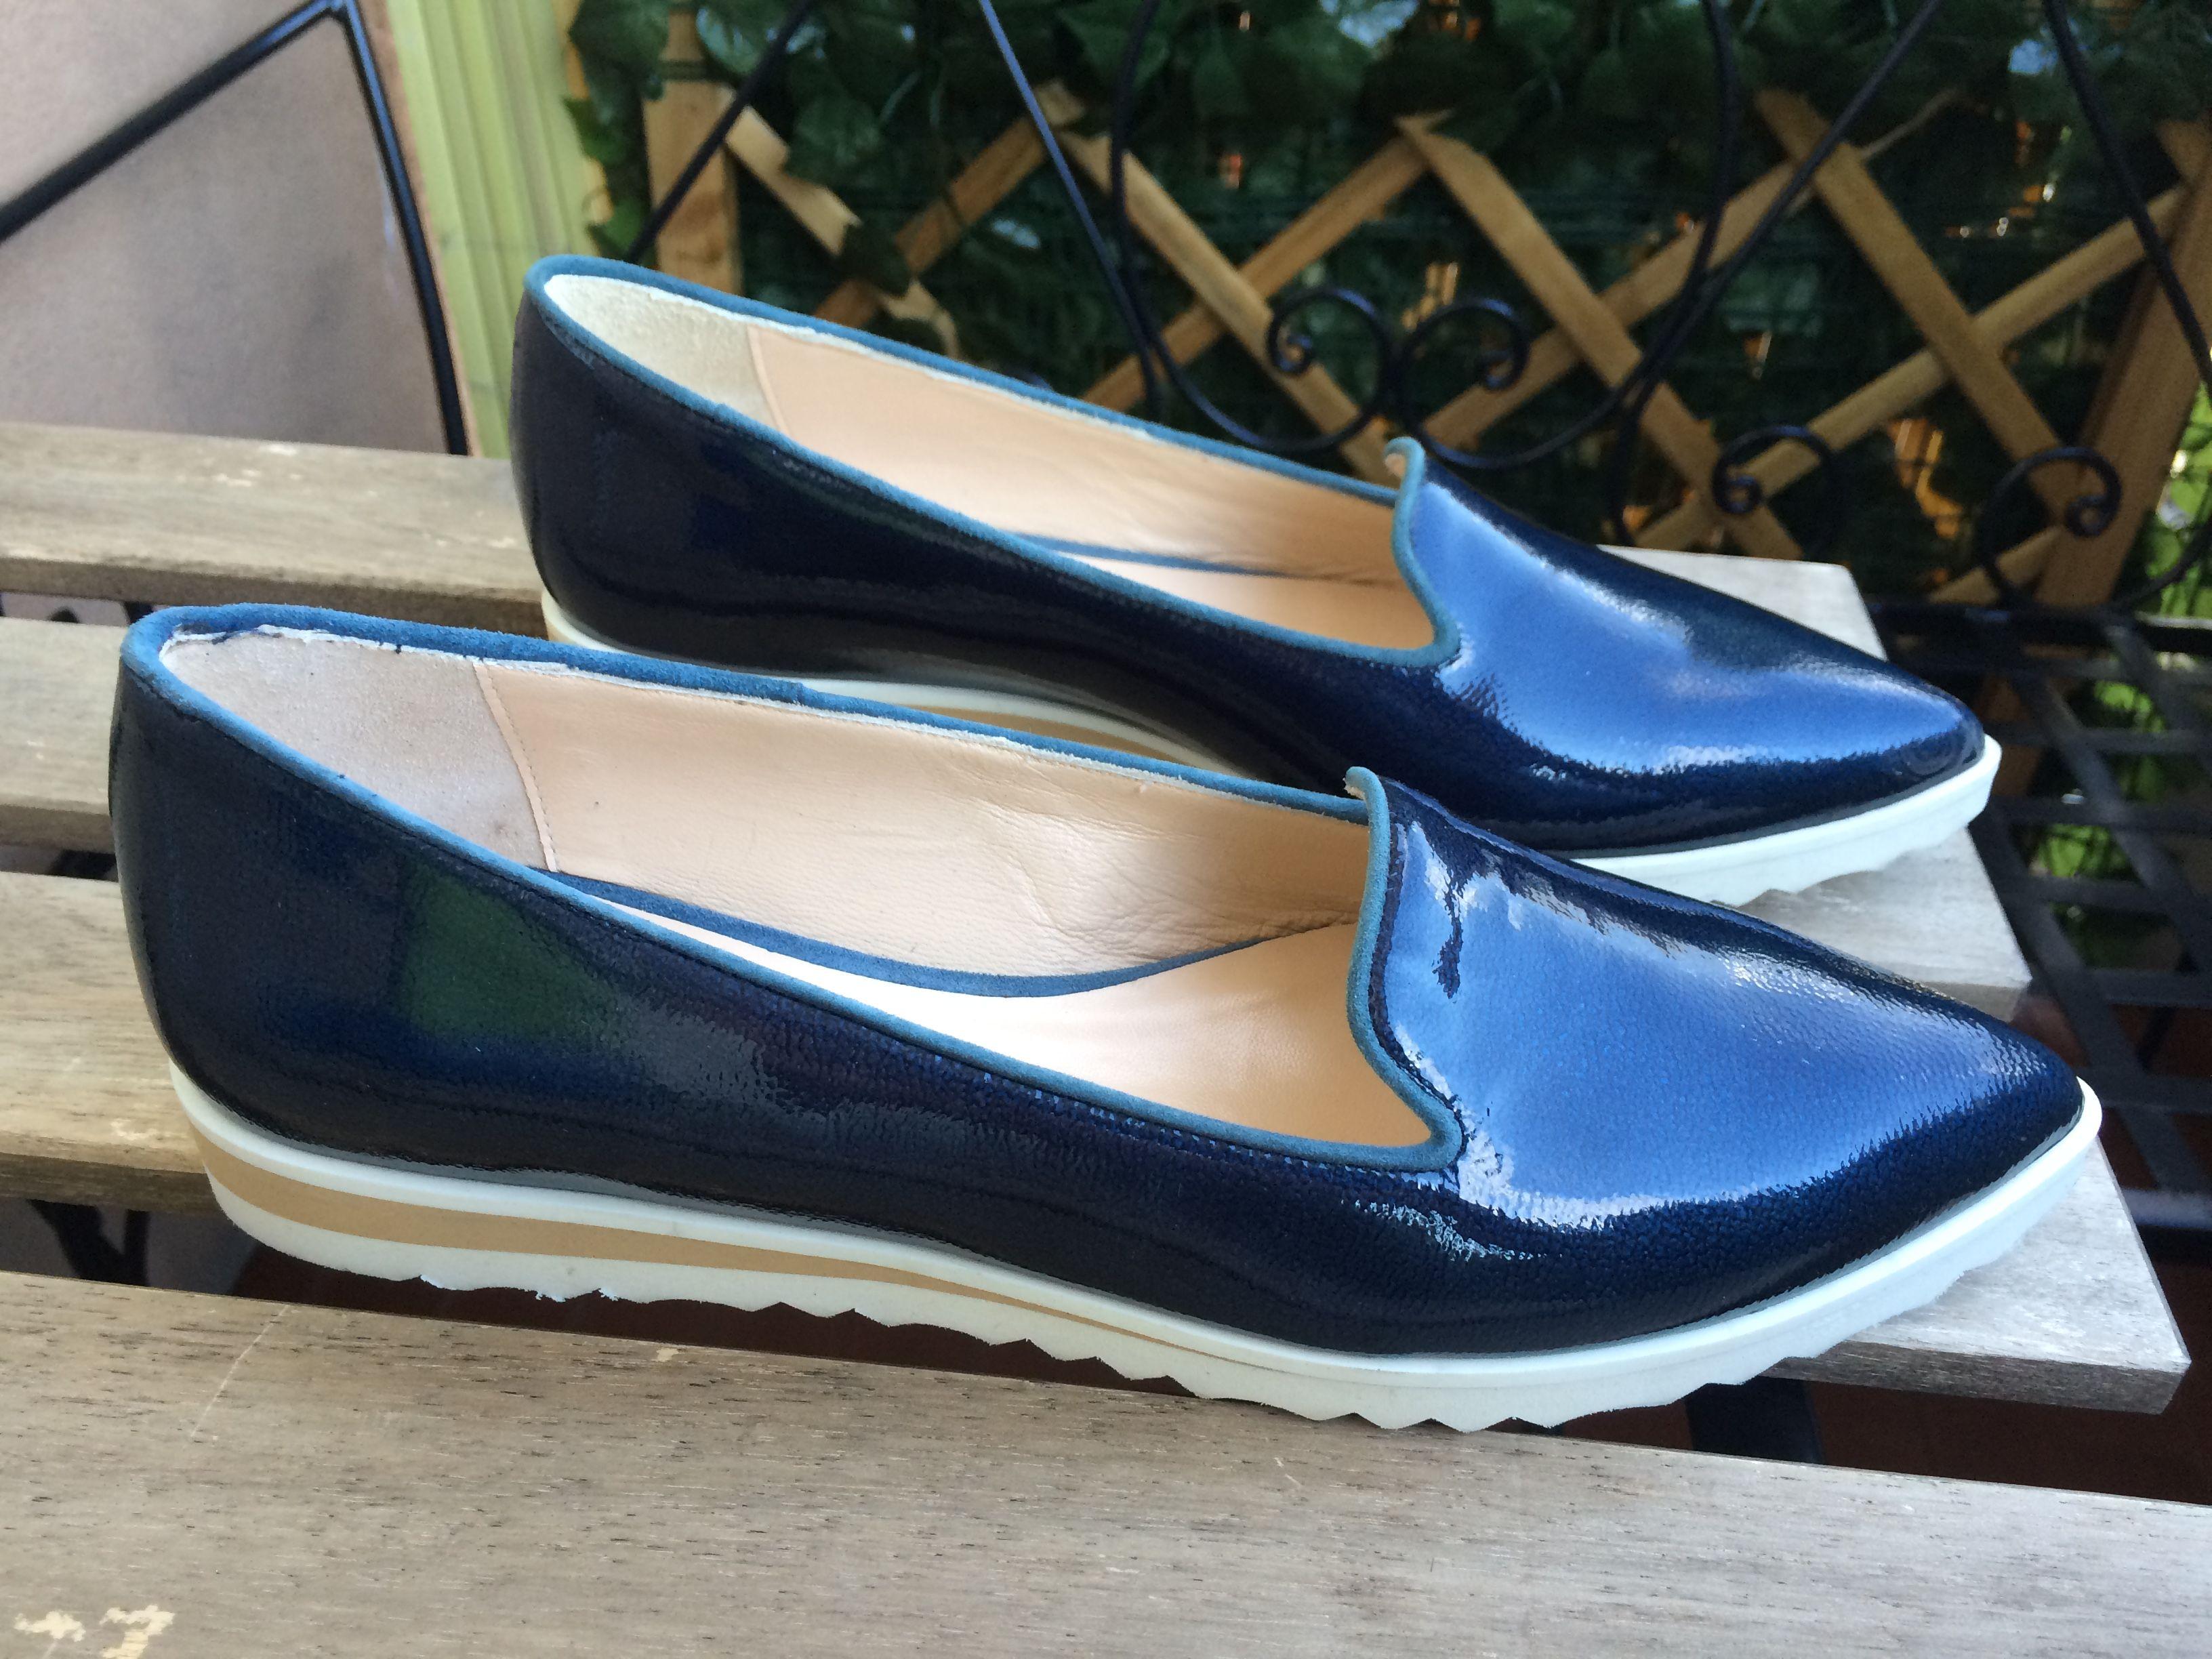 Milan, 2nd July 2016 #shoes